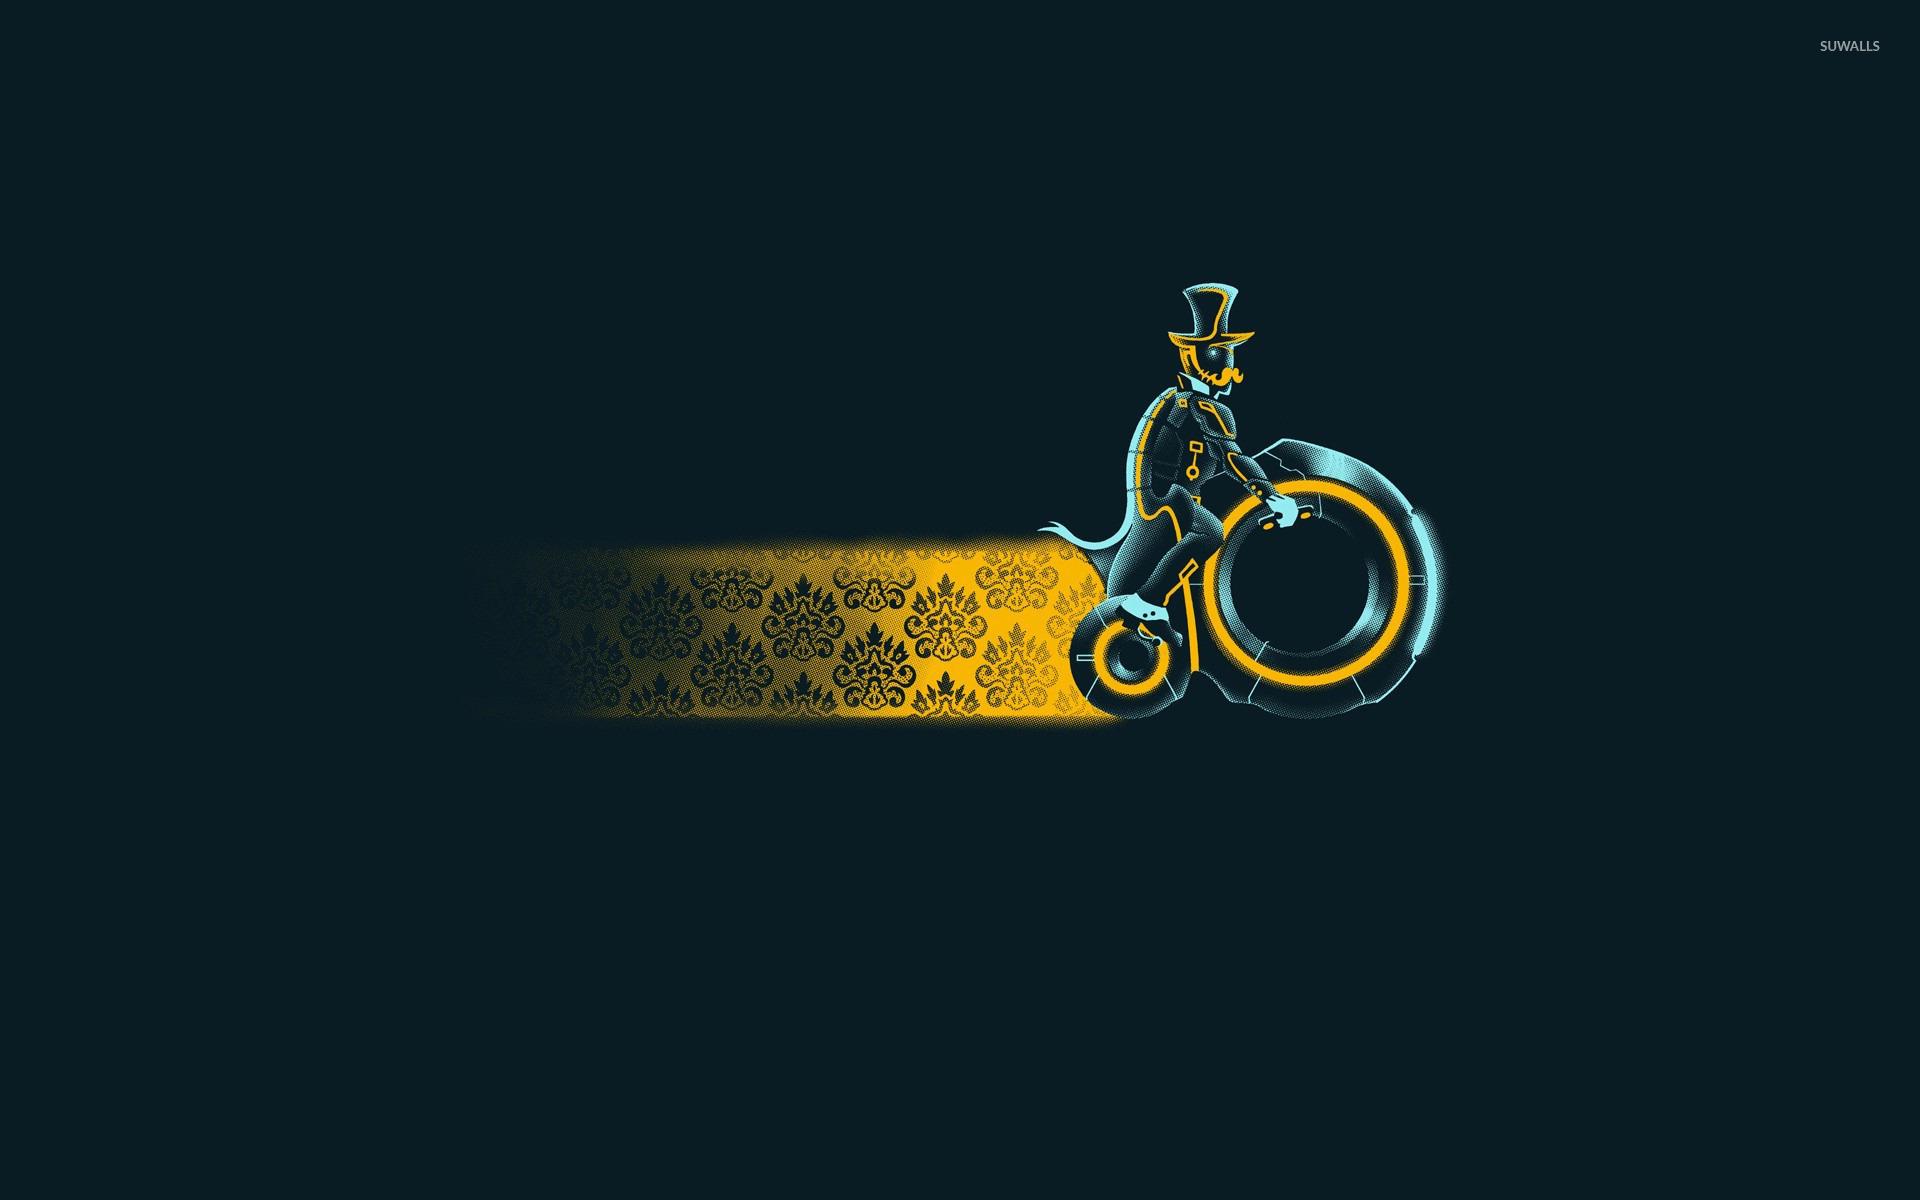 Vintage tron bike wallpaper - Funny wallpapers - #16945